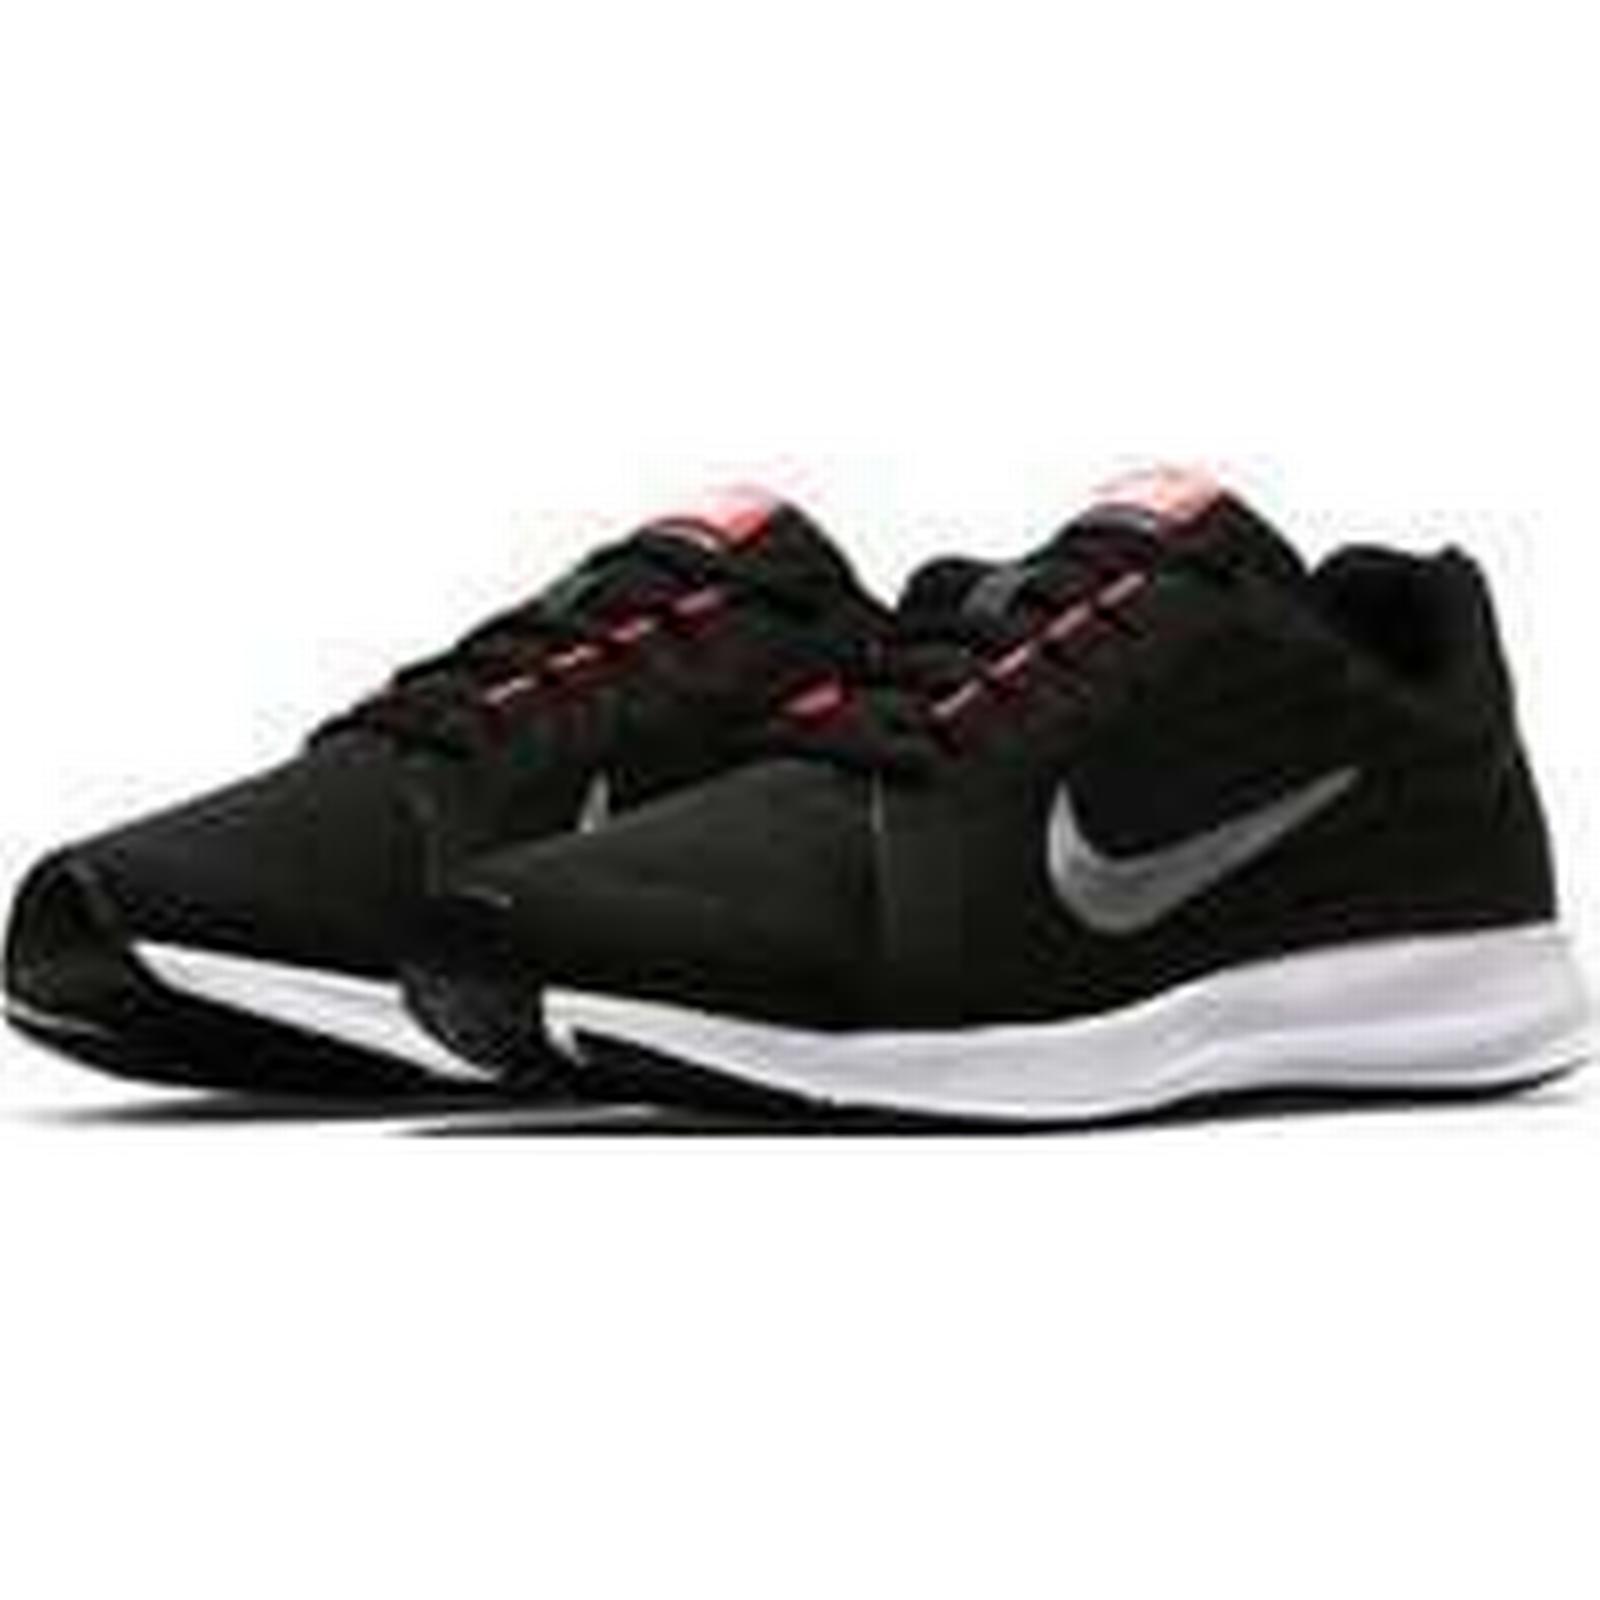 Spartoo.co.uk Nike Girls' Downshifter 922855 8 (GS) Running Shoe 922855 Downshifter women's Shoes (Trainers) in Black f6c8c6